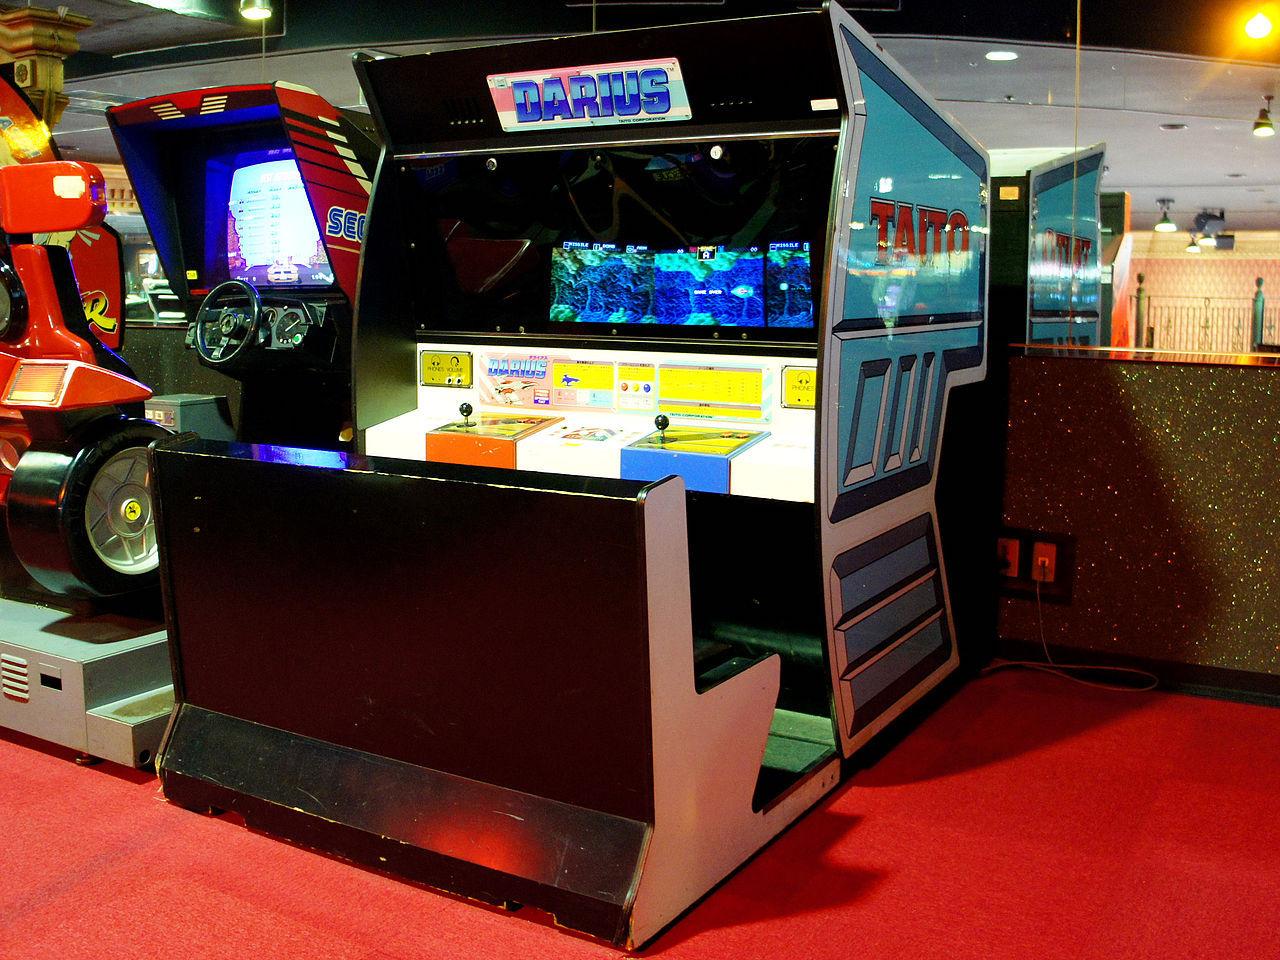 Darius Arcade Cabinet mit drei Bildschirmen. (Bild: 空練 via Wikipedia)